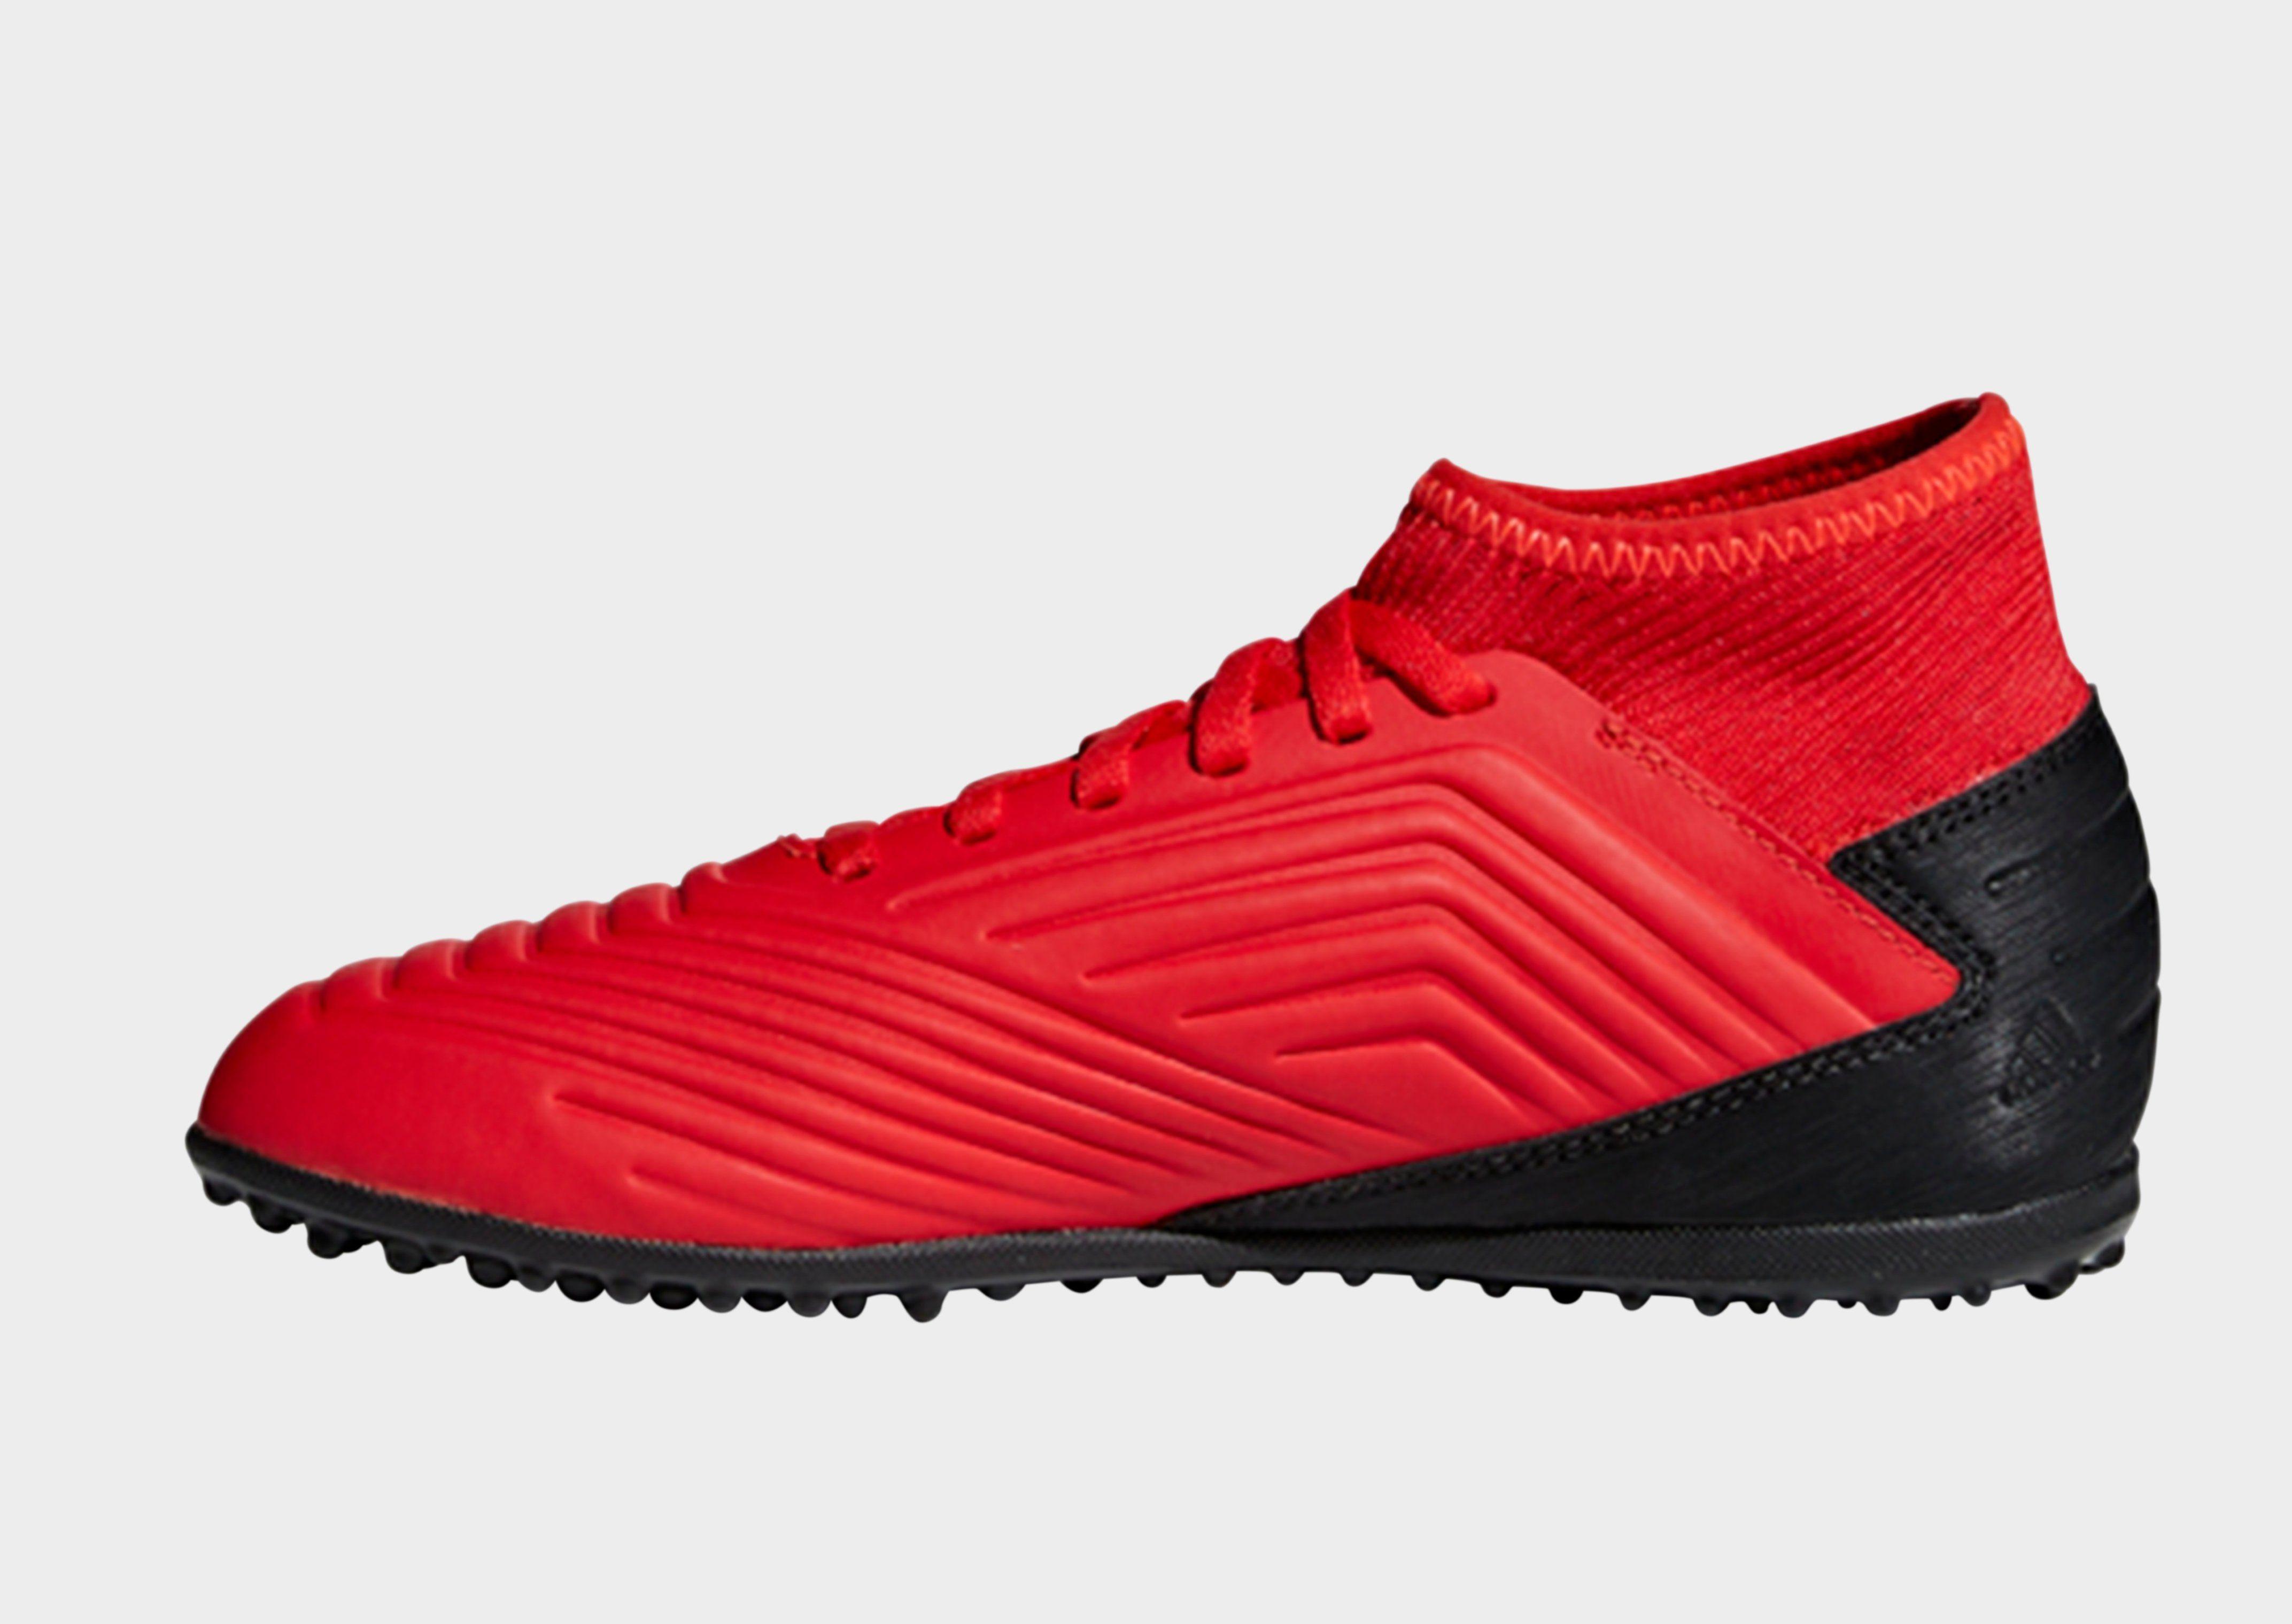 fed9382e99 adidas Performance Predator Tango 19.3 Turf Boots   JD Sports